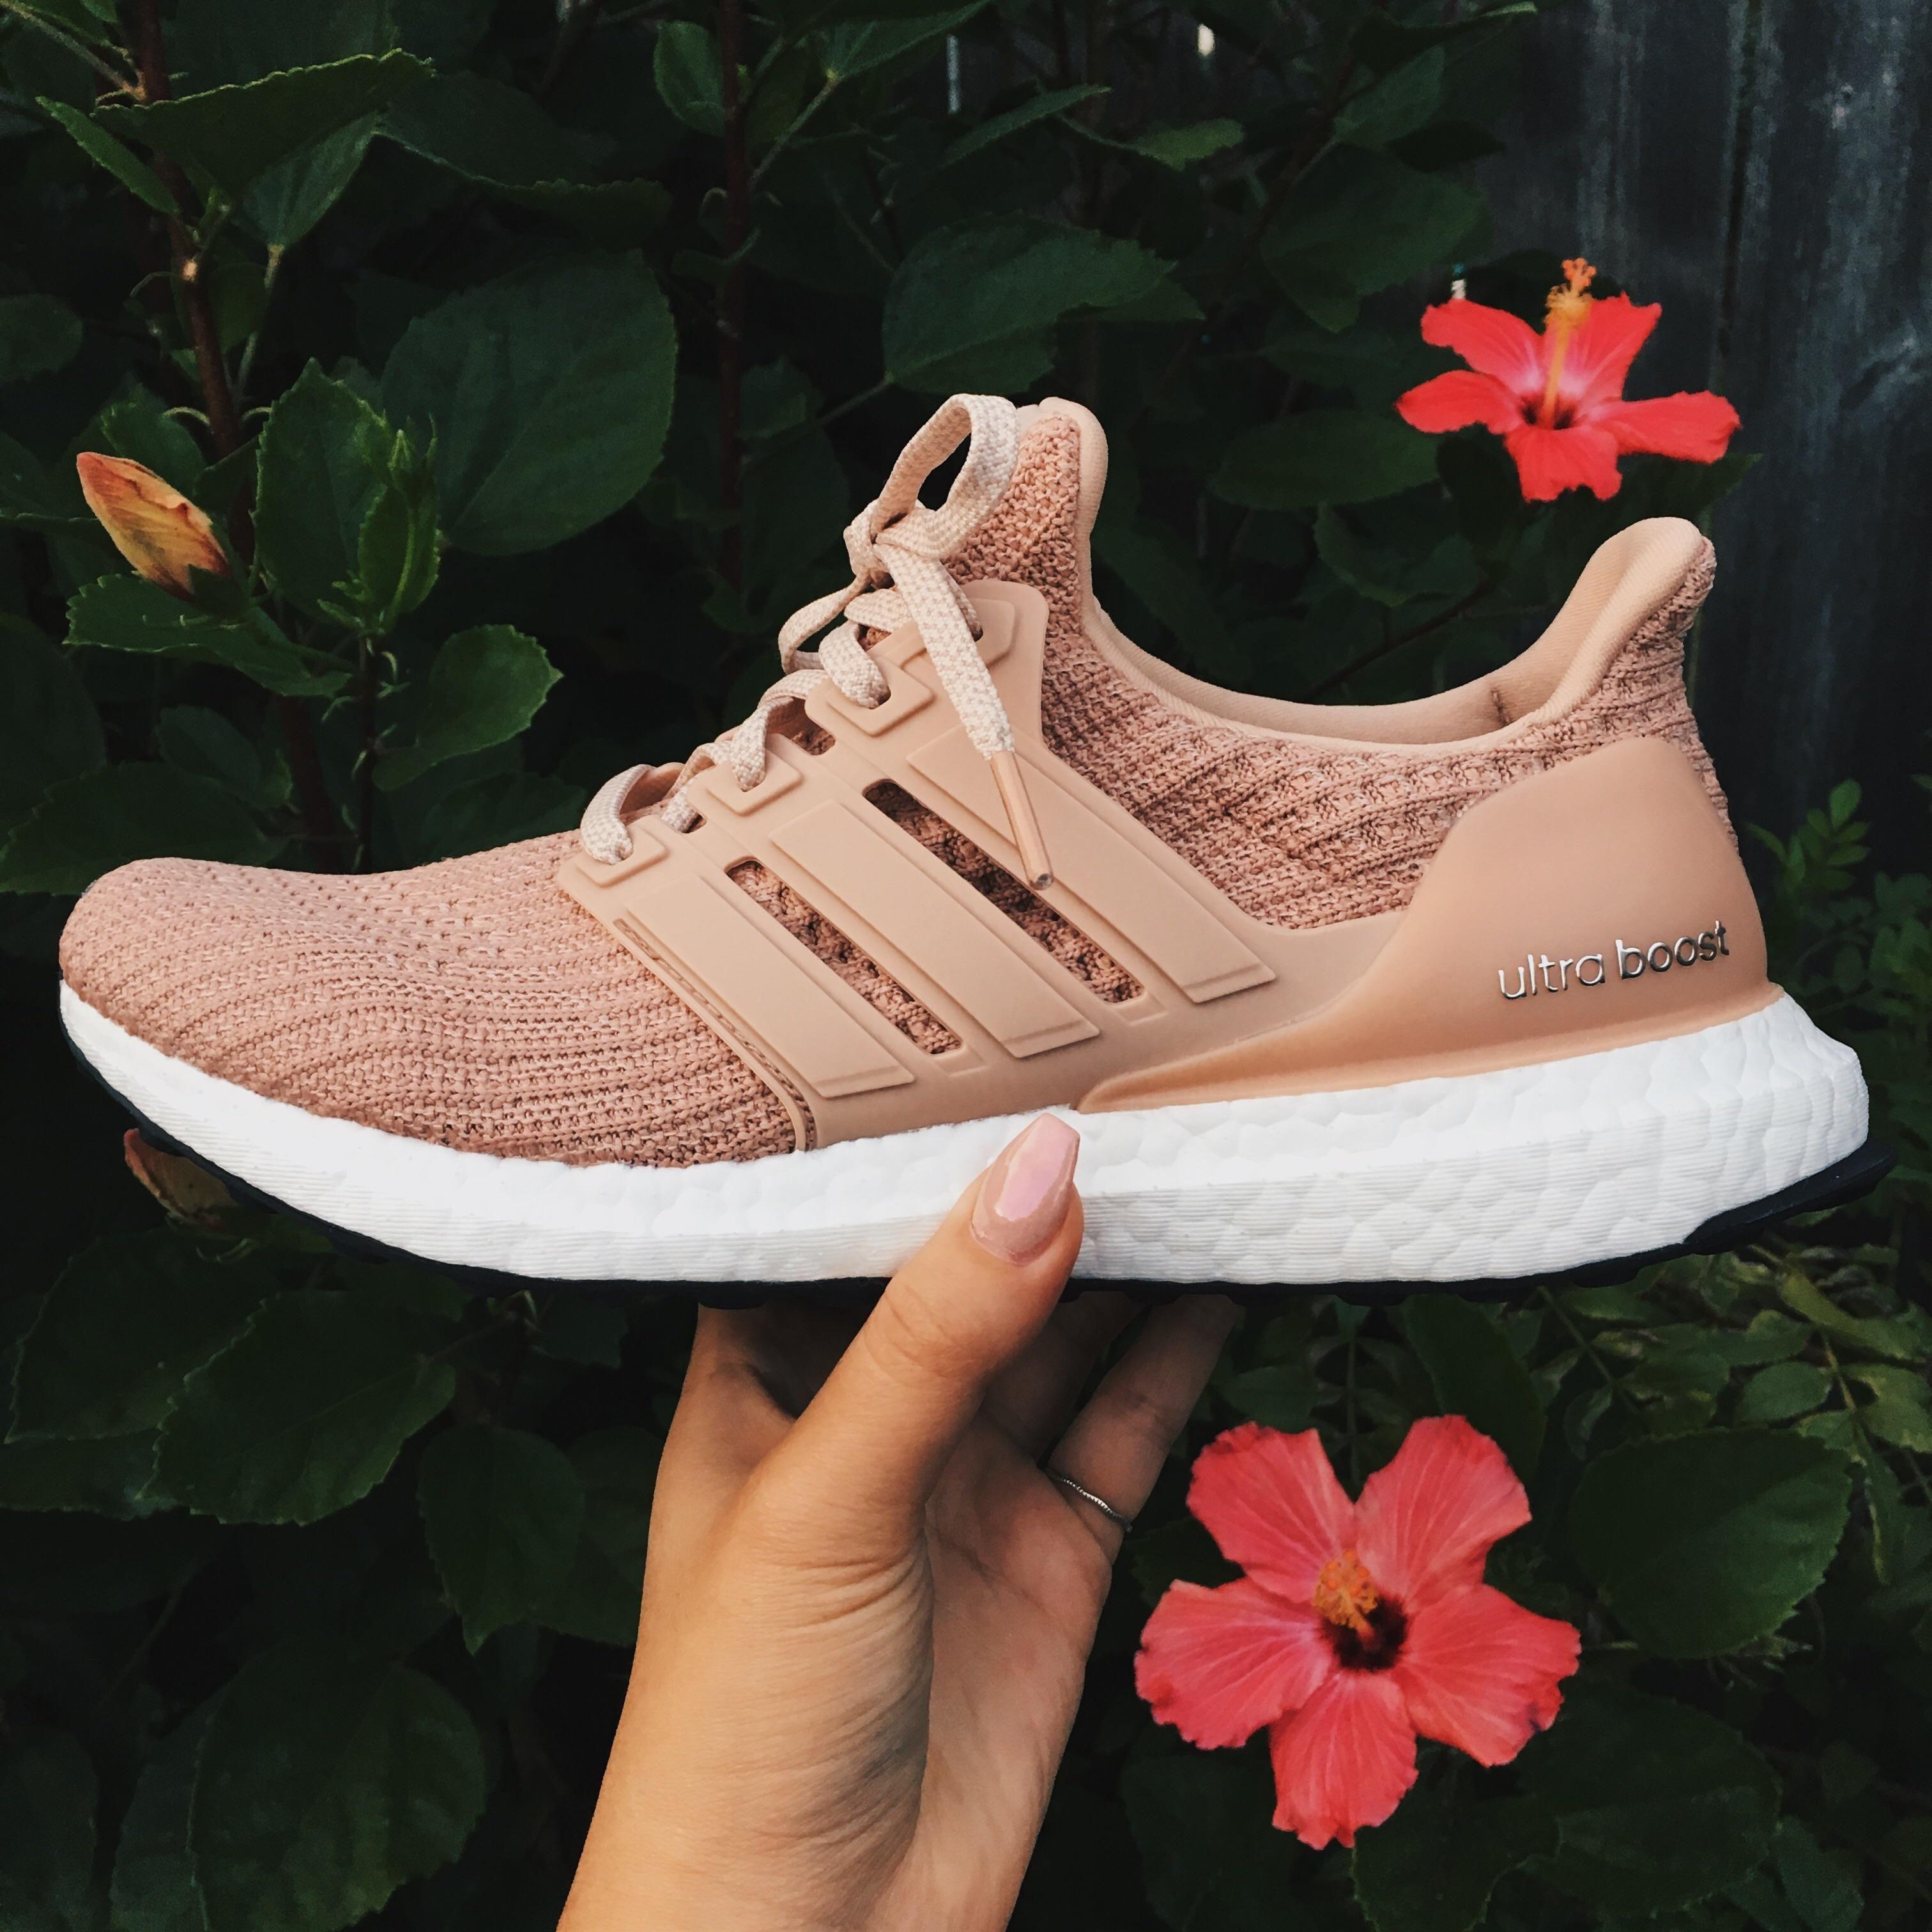 97f9fc9300d ultraboost 4.0 ash pearl/champagne pink | Nike Sneakers in 2019 ...